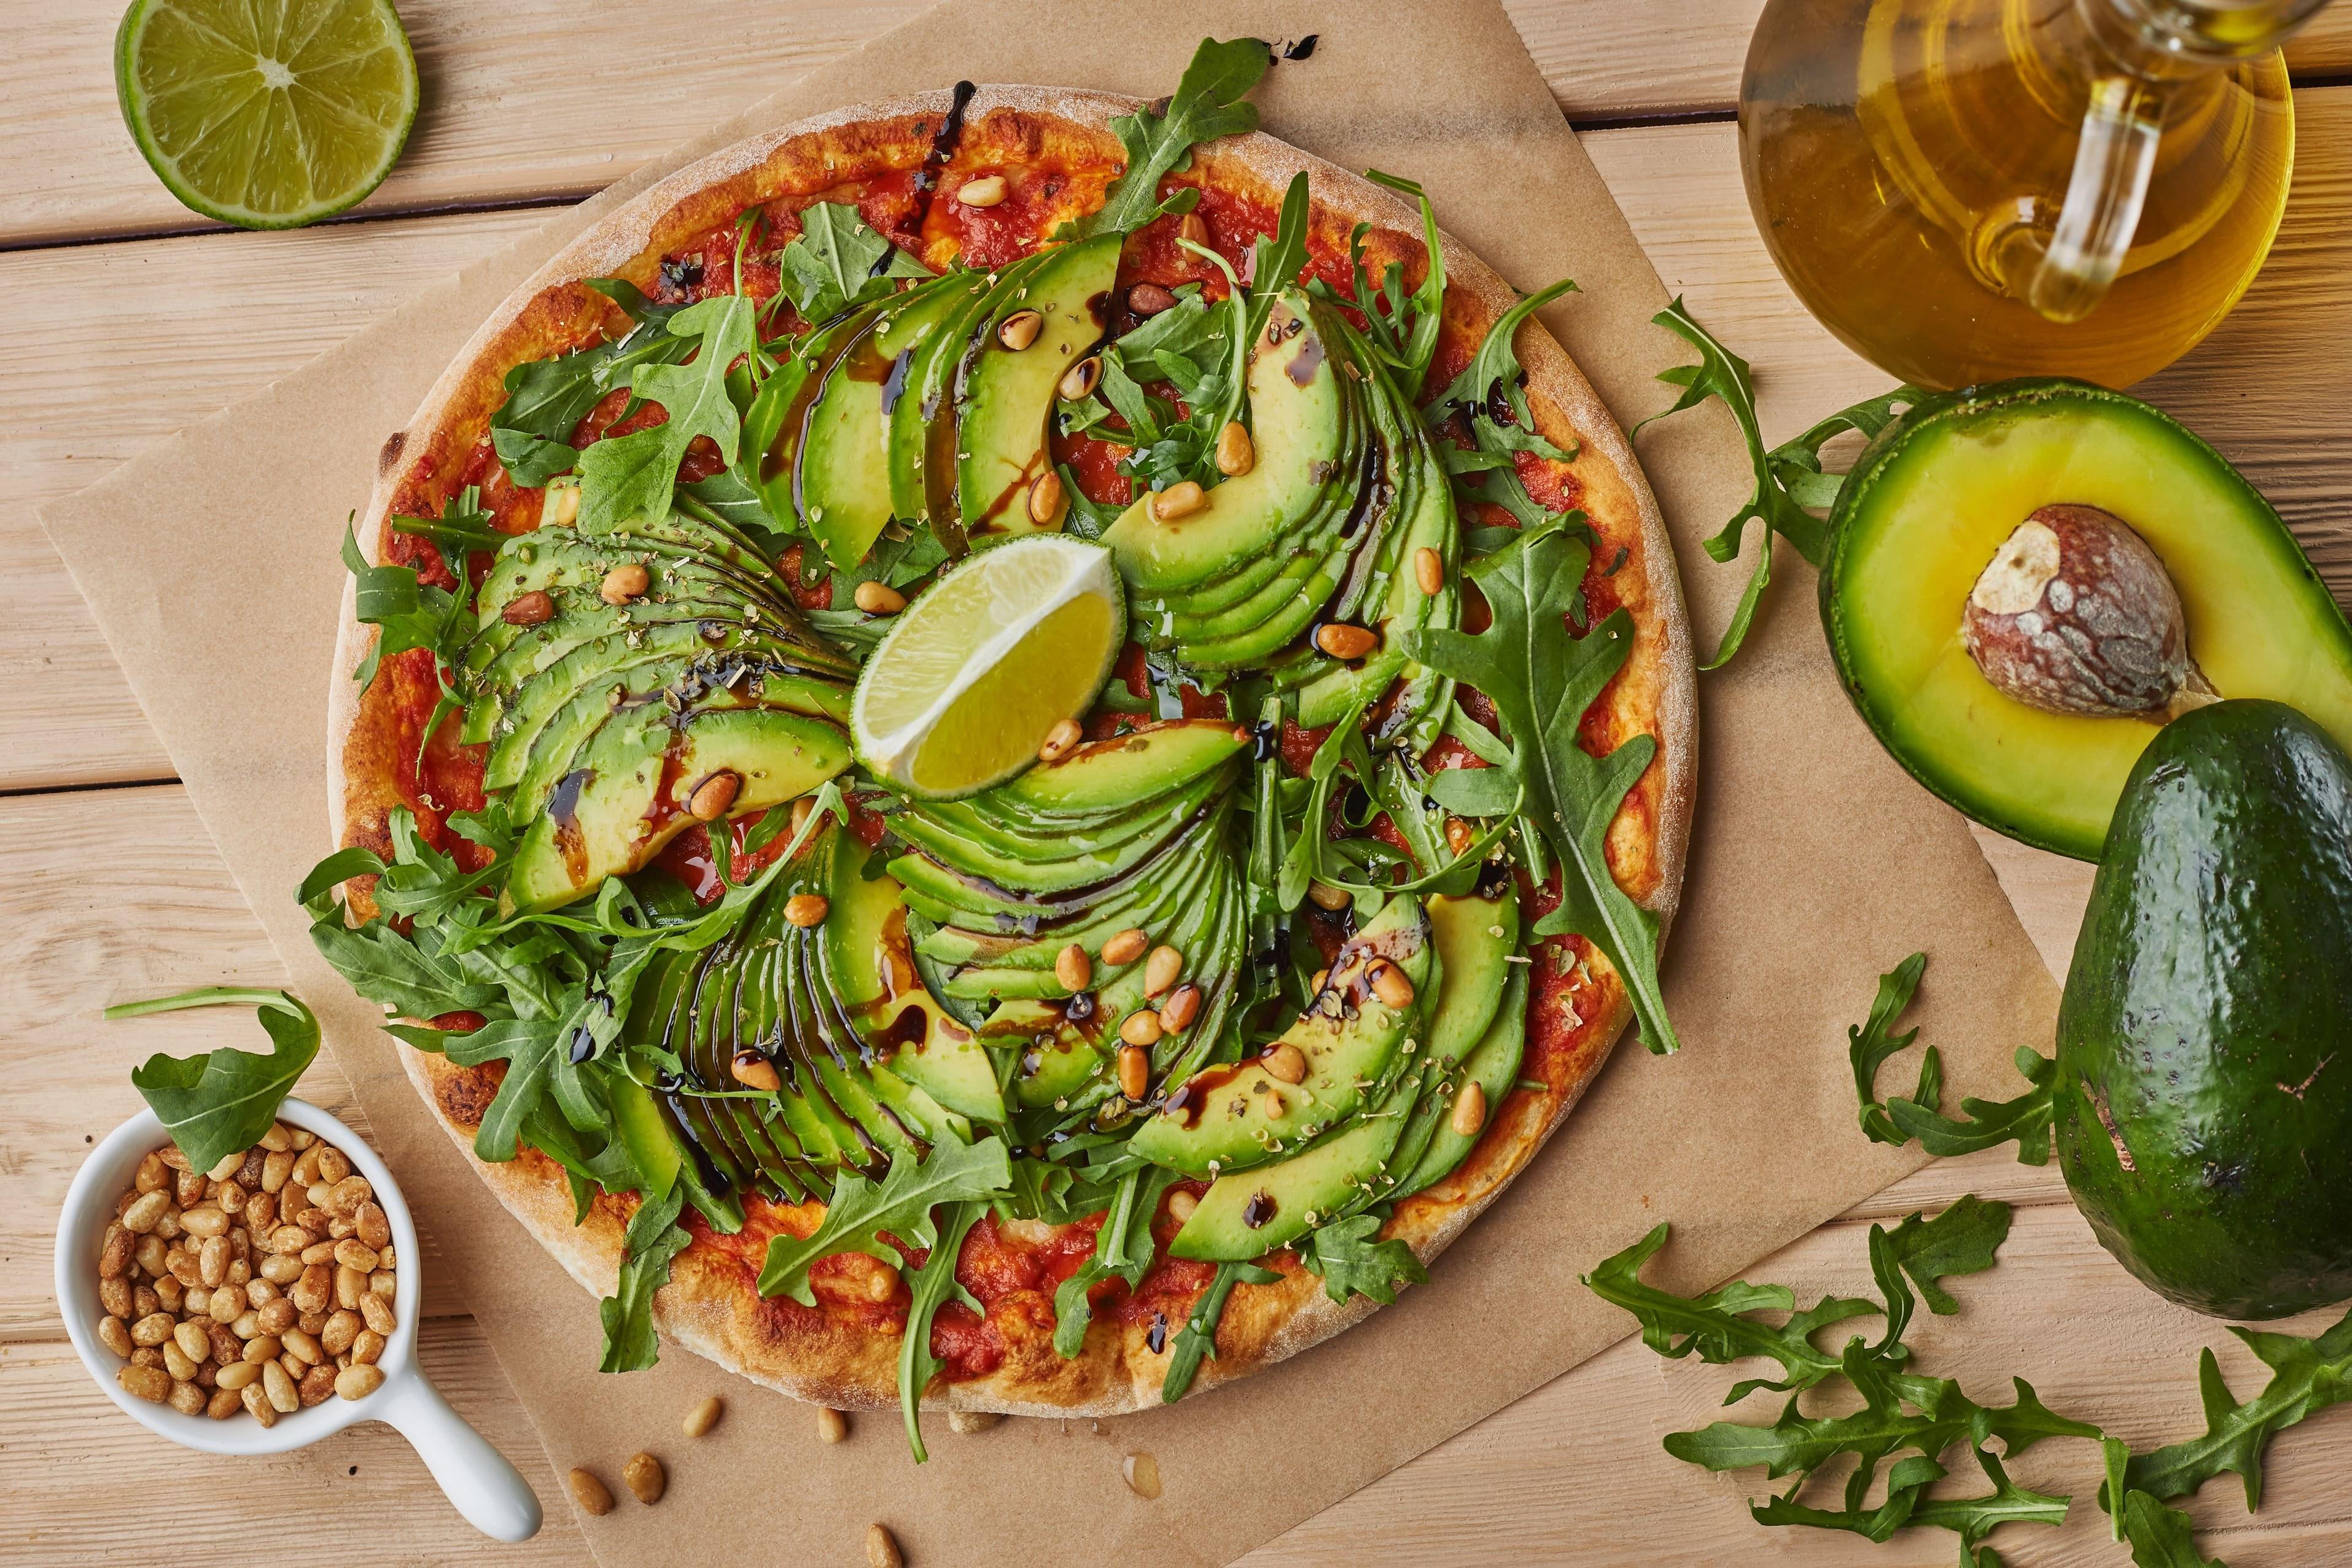 Рецепт от шефа: пицца верде с авокадо и рукколой